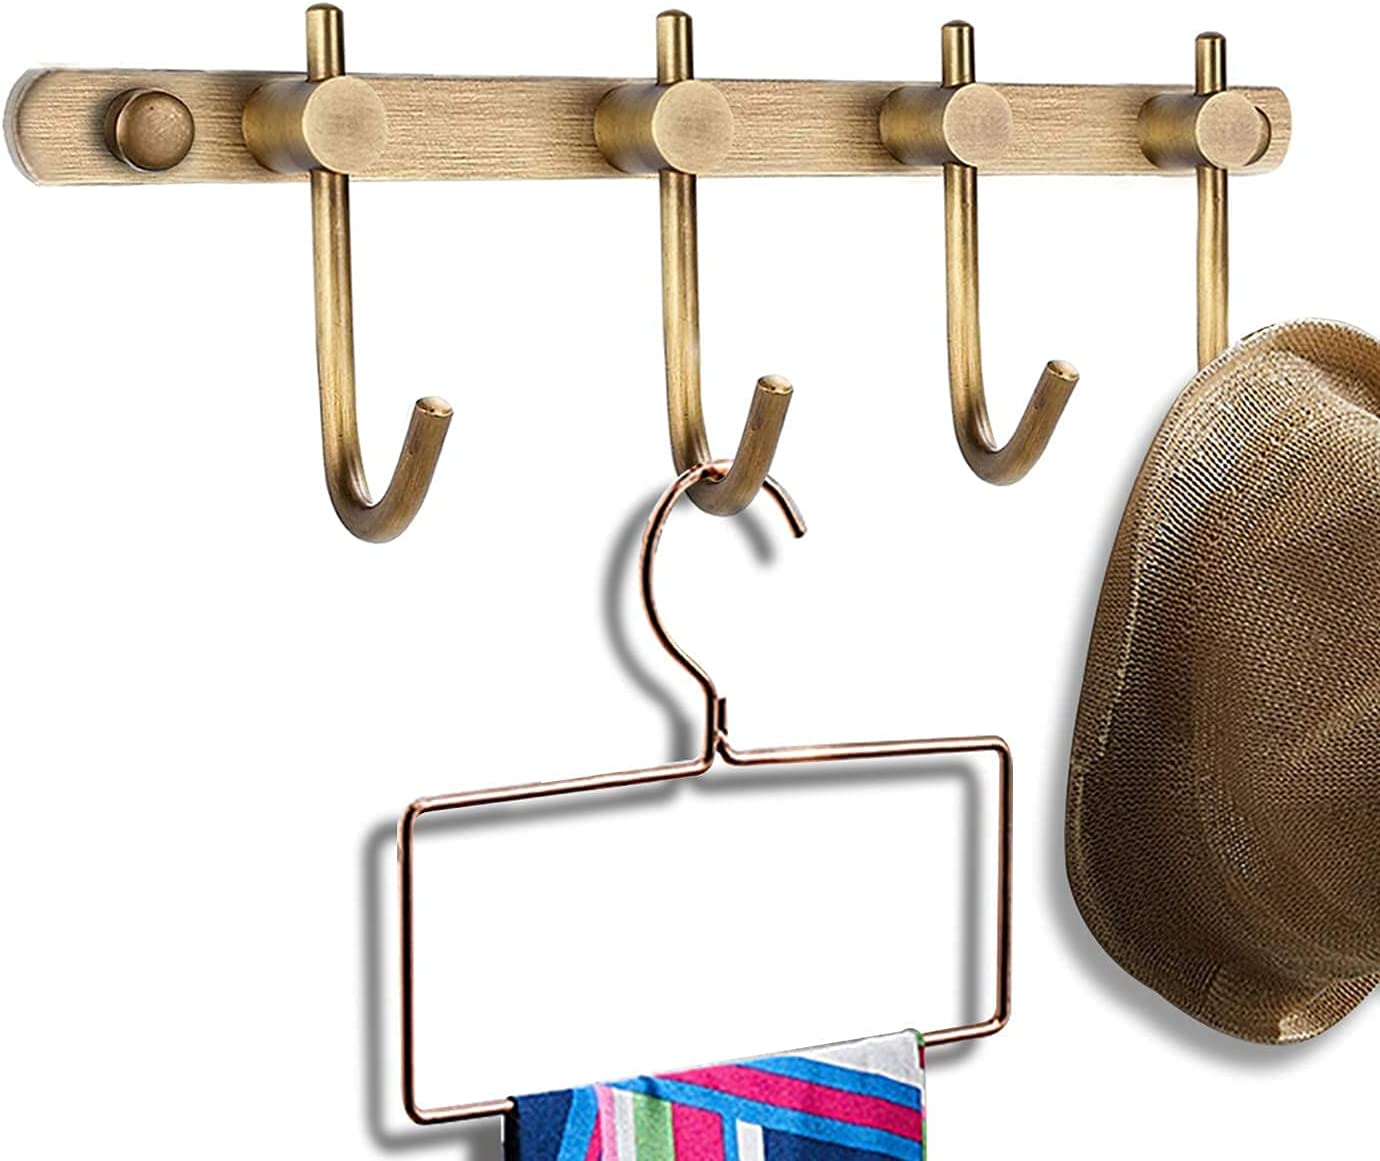 SOLID BRASS HAT AND COAT RAIL RACK HANGER WARDROBE BATHROOM BEDROOM HOOKS PEGS